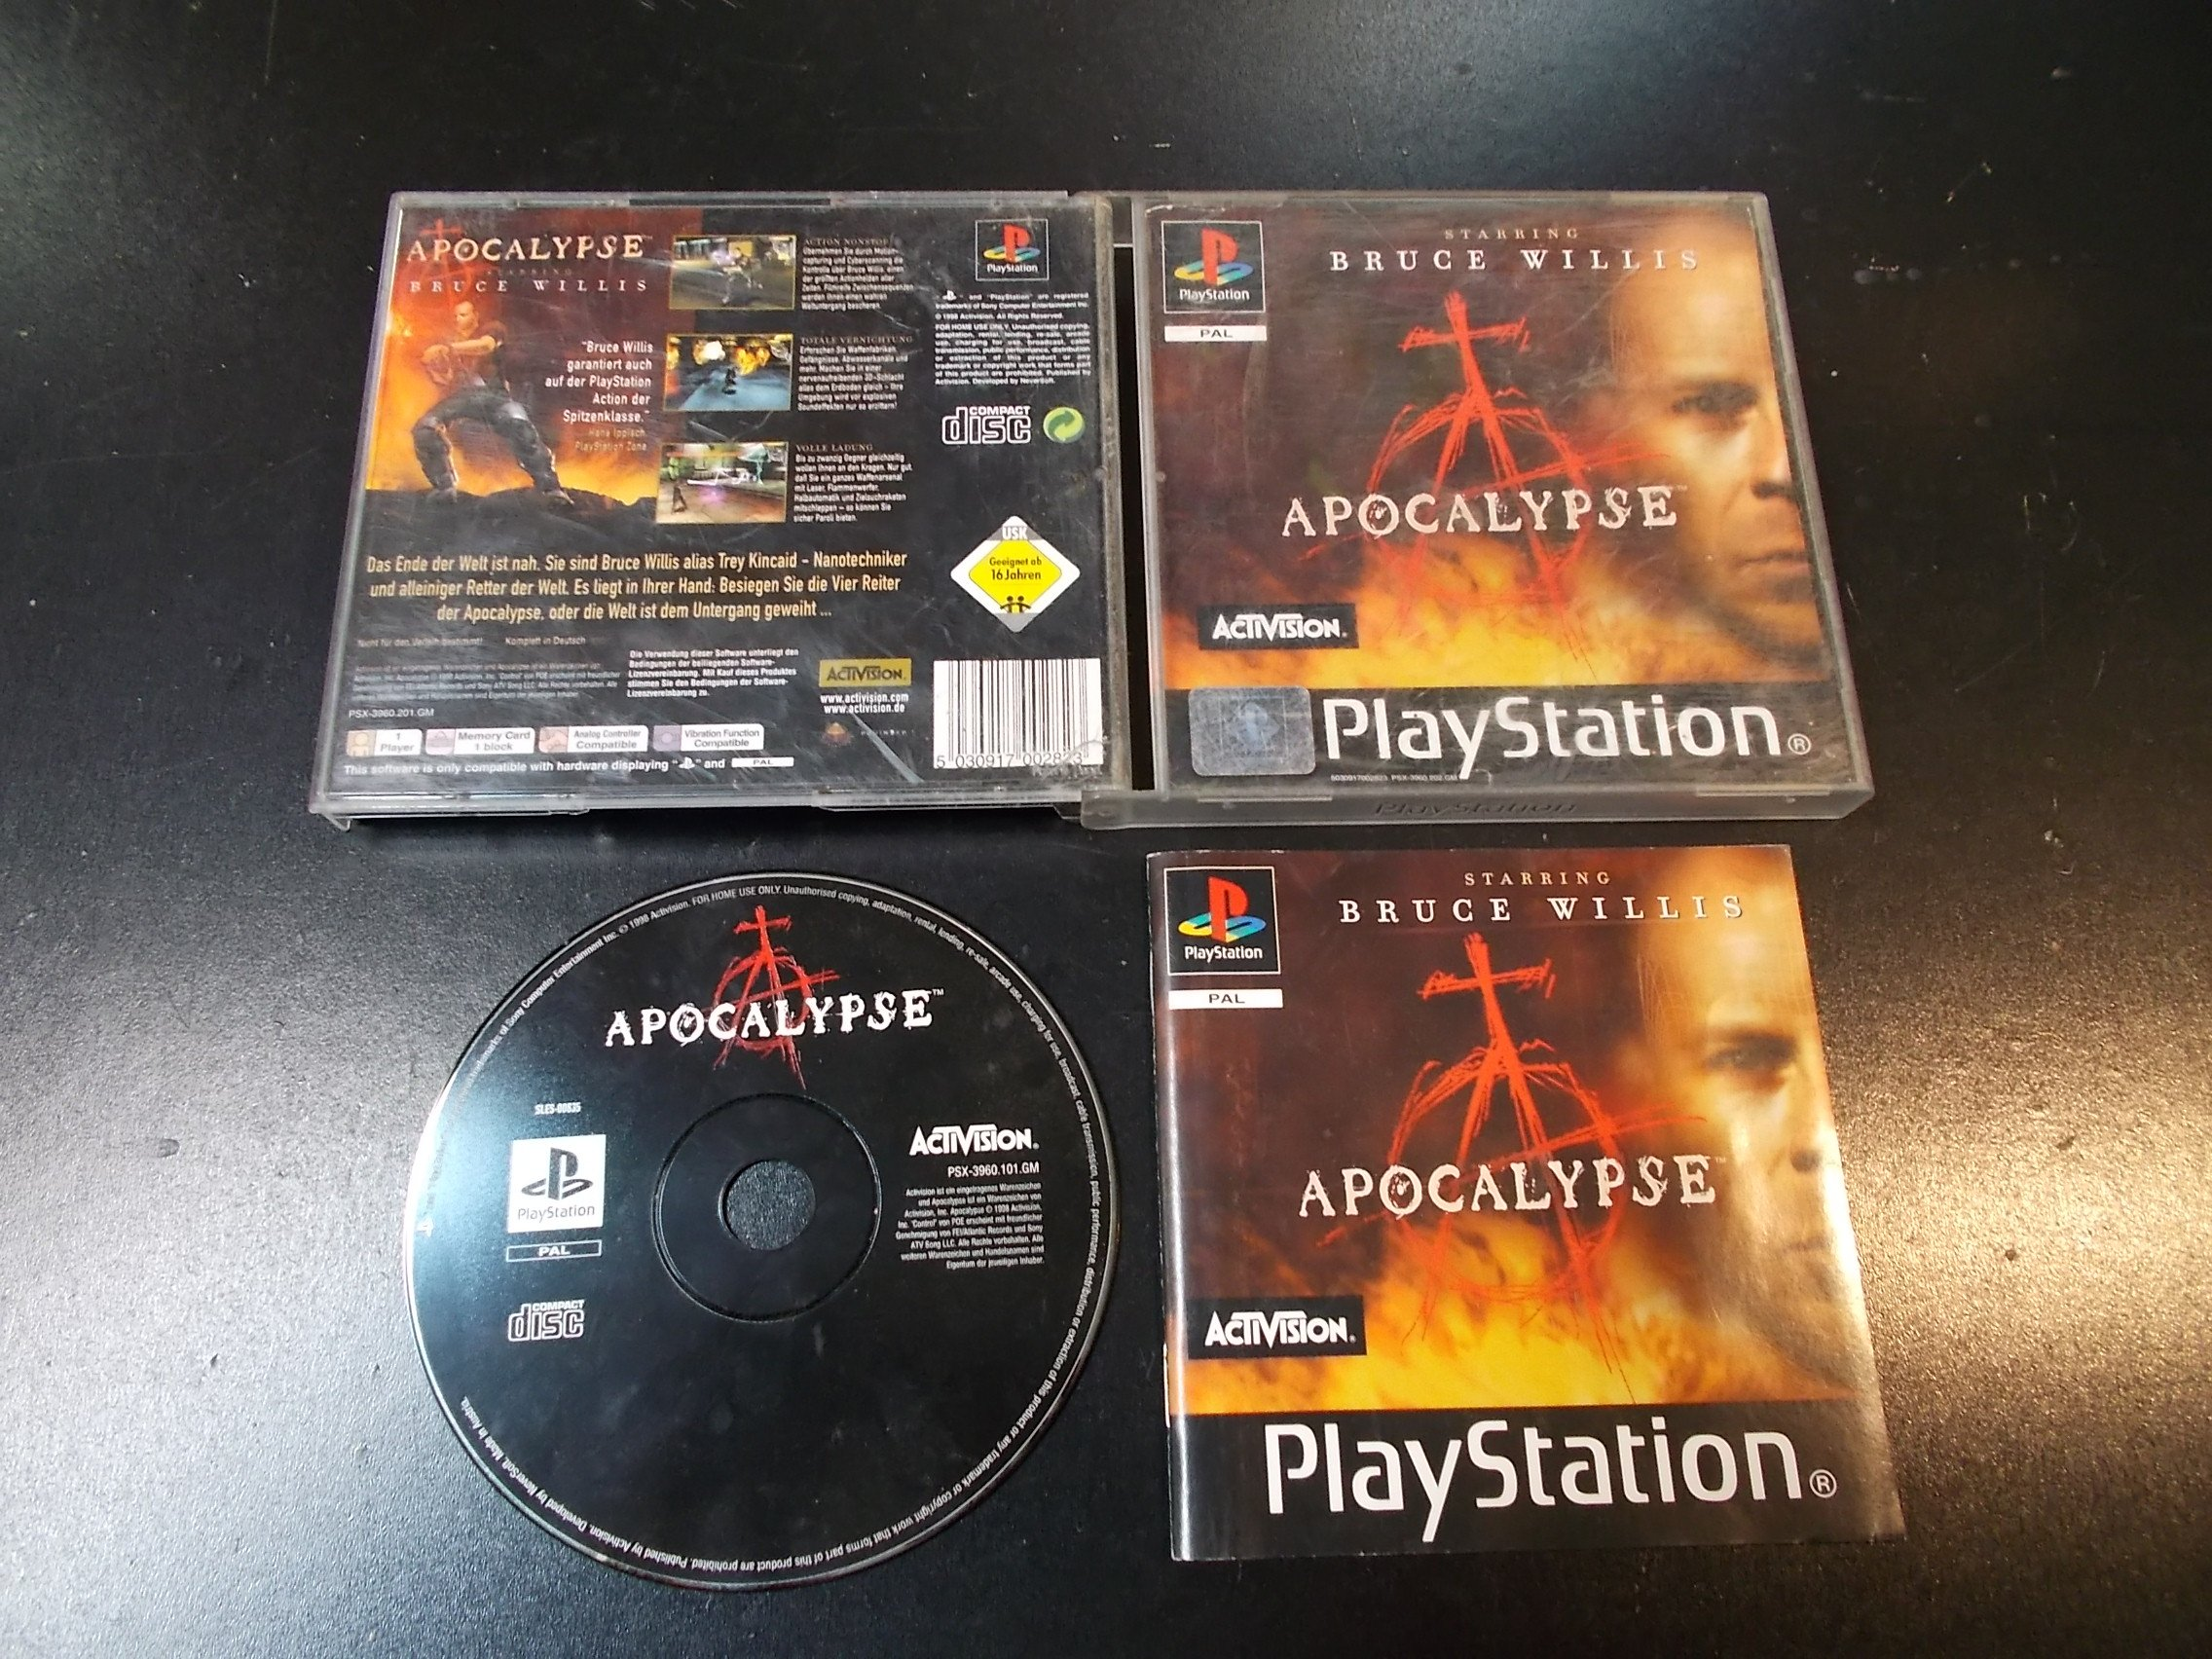 Apocalypse - GRA Psx Ps1 Sklep